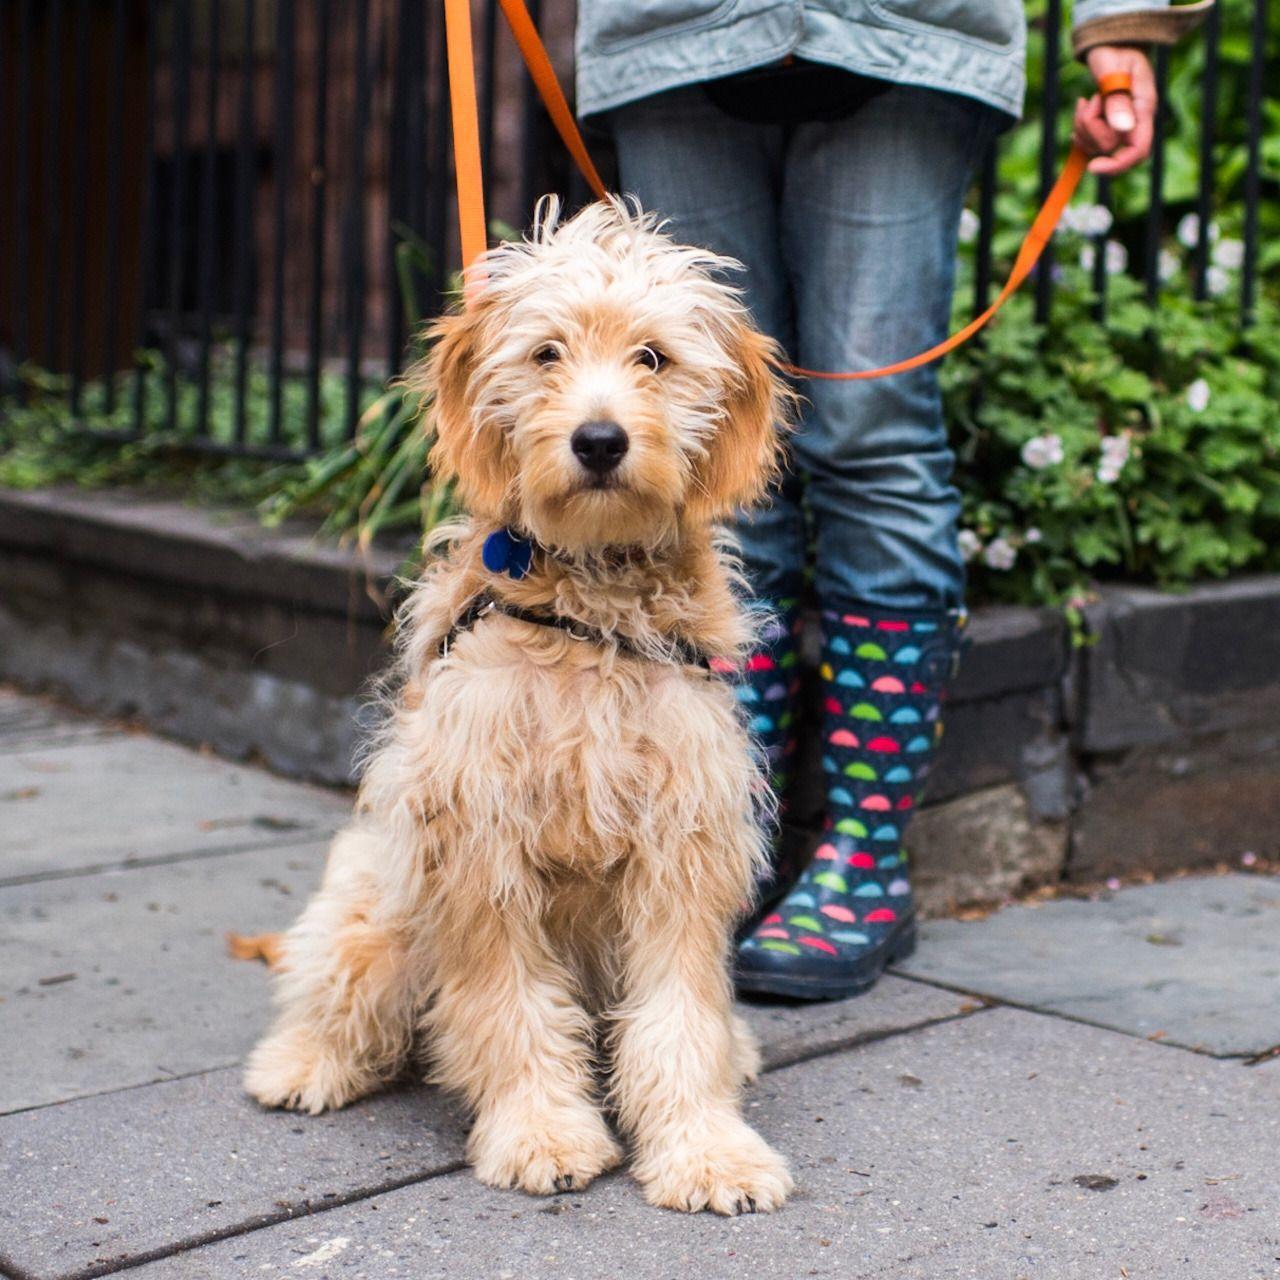 Puck Goldendoodle 5 M O Hicks Joralemon St Brooklyn Ny I M Just Walking Him But He S A Really Good Dog Who Loves Bir Goldendoodle Best Dogs Dogs